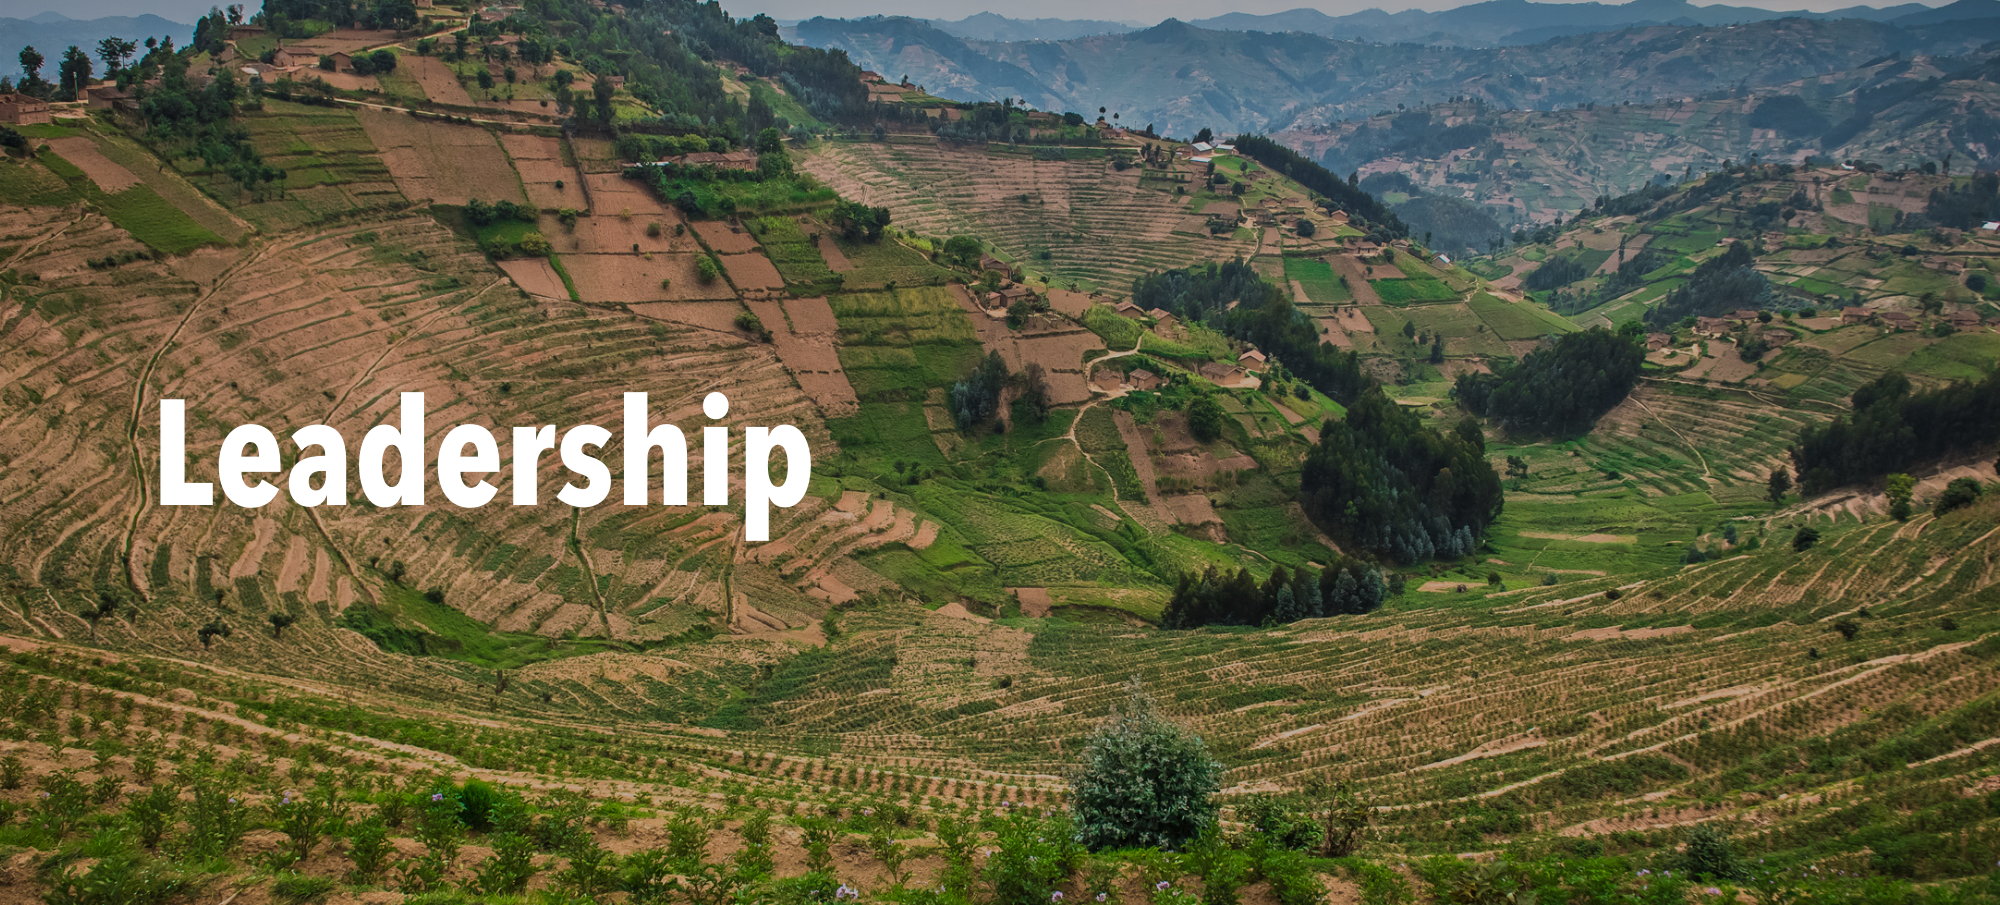 "Terraces on hillside in Rwanda with text ""Leadership"""